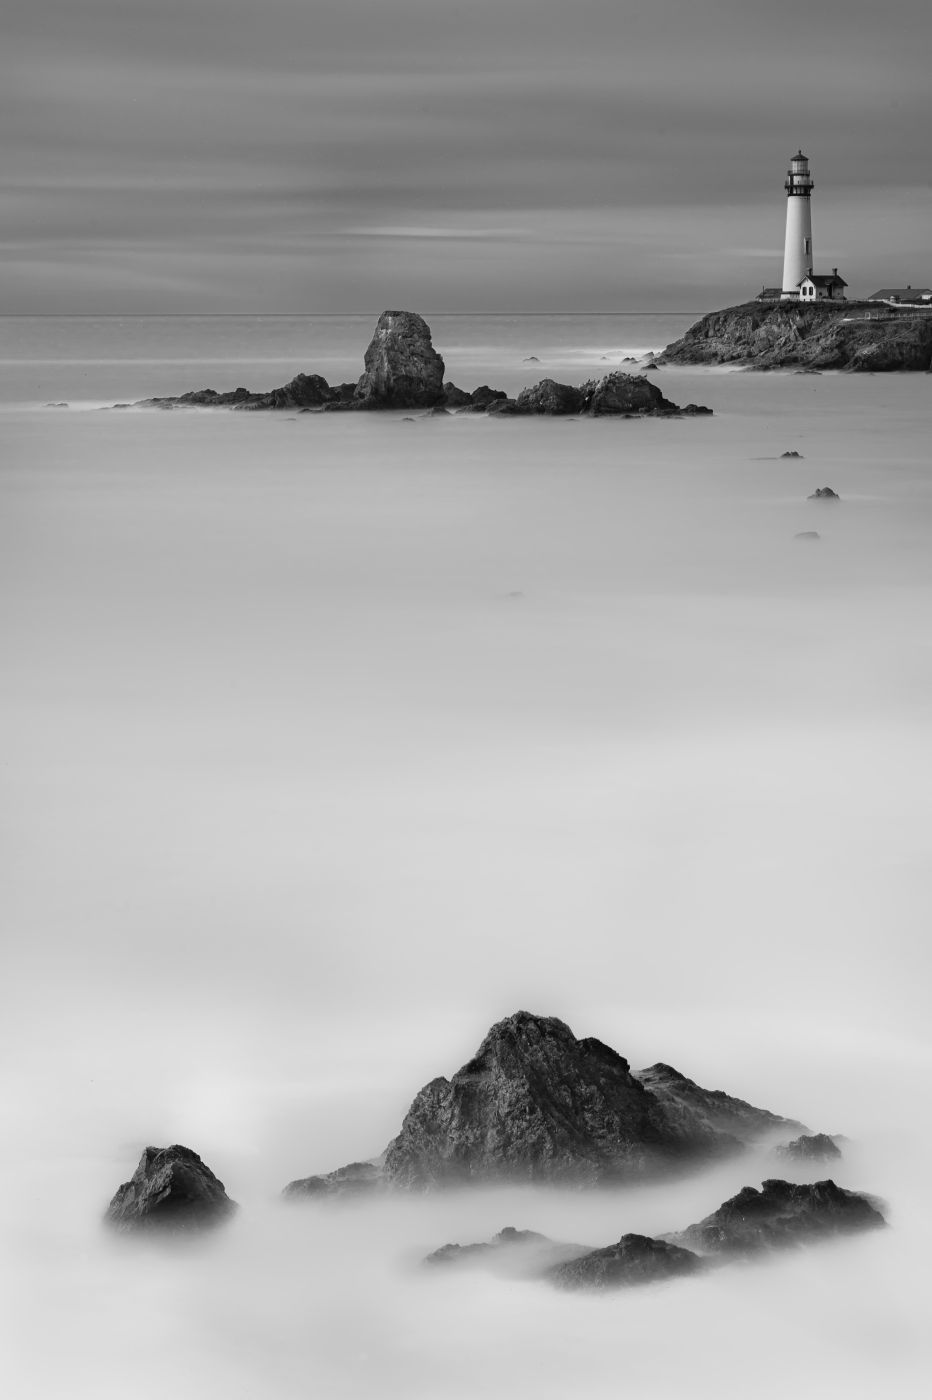 Pigeon point lighthouse, USA